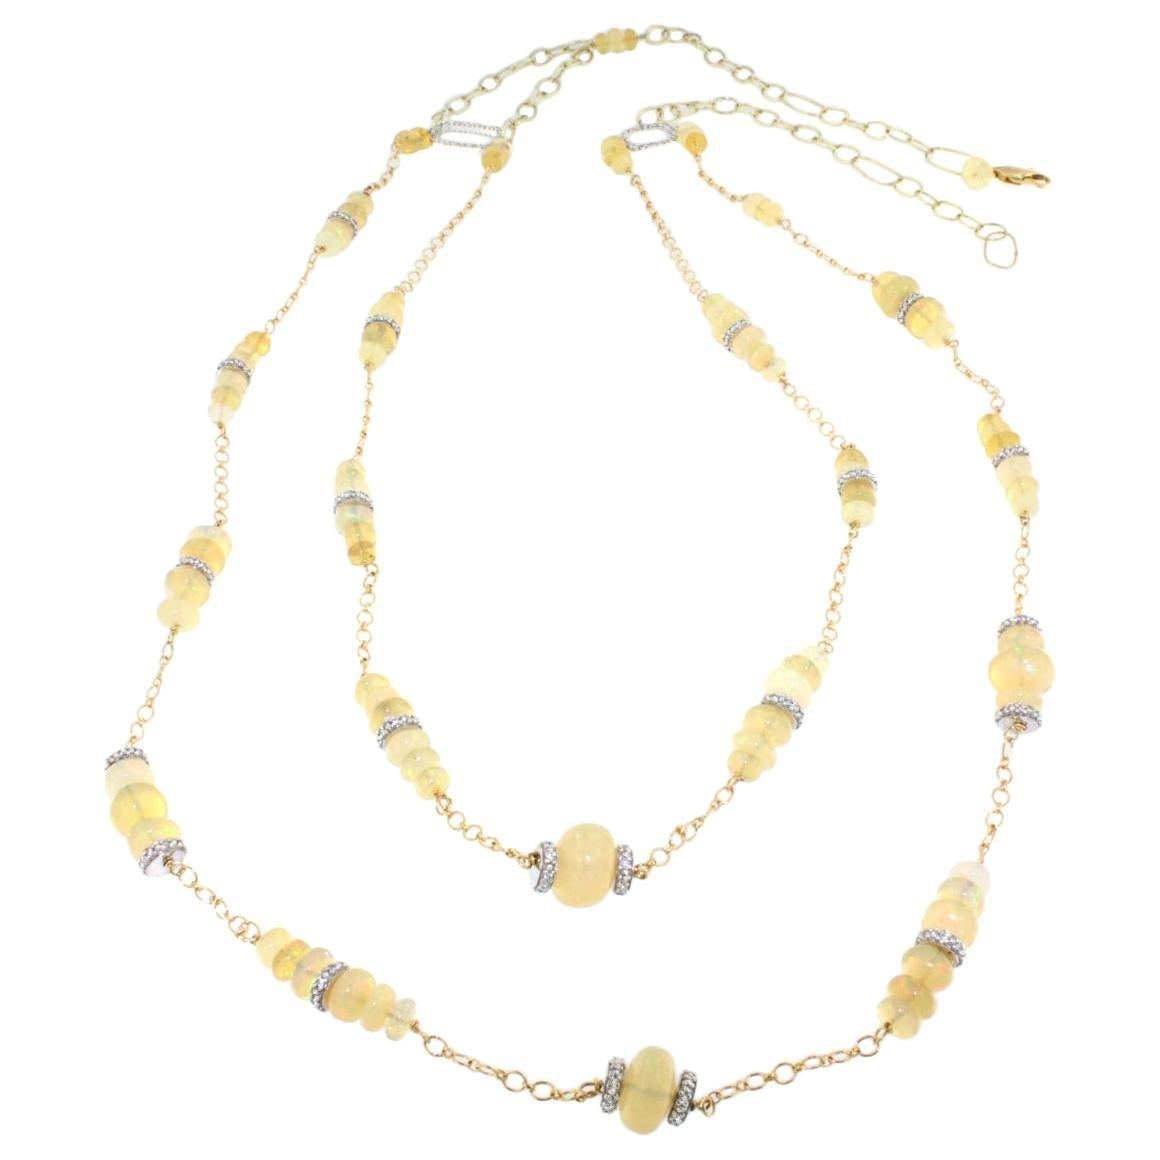 18k Yellow White Gold with Opal White Diamonds Bracelet Earrings Necklace Set